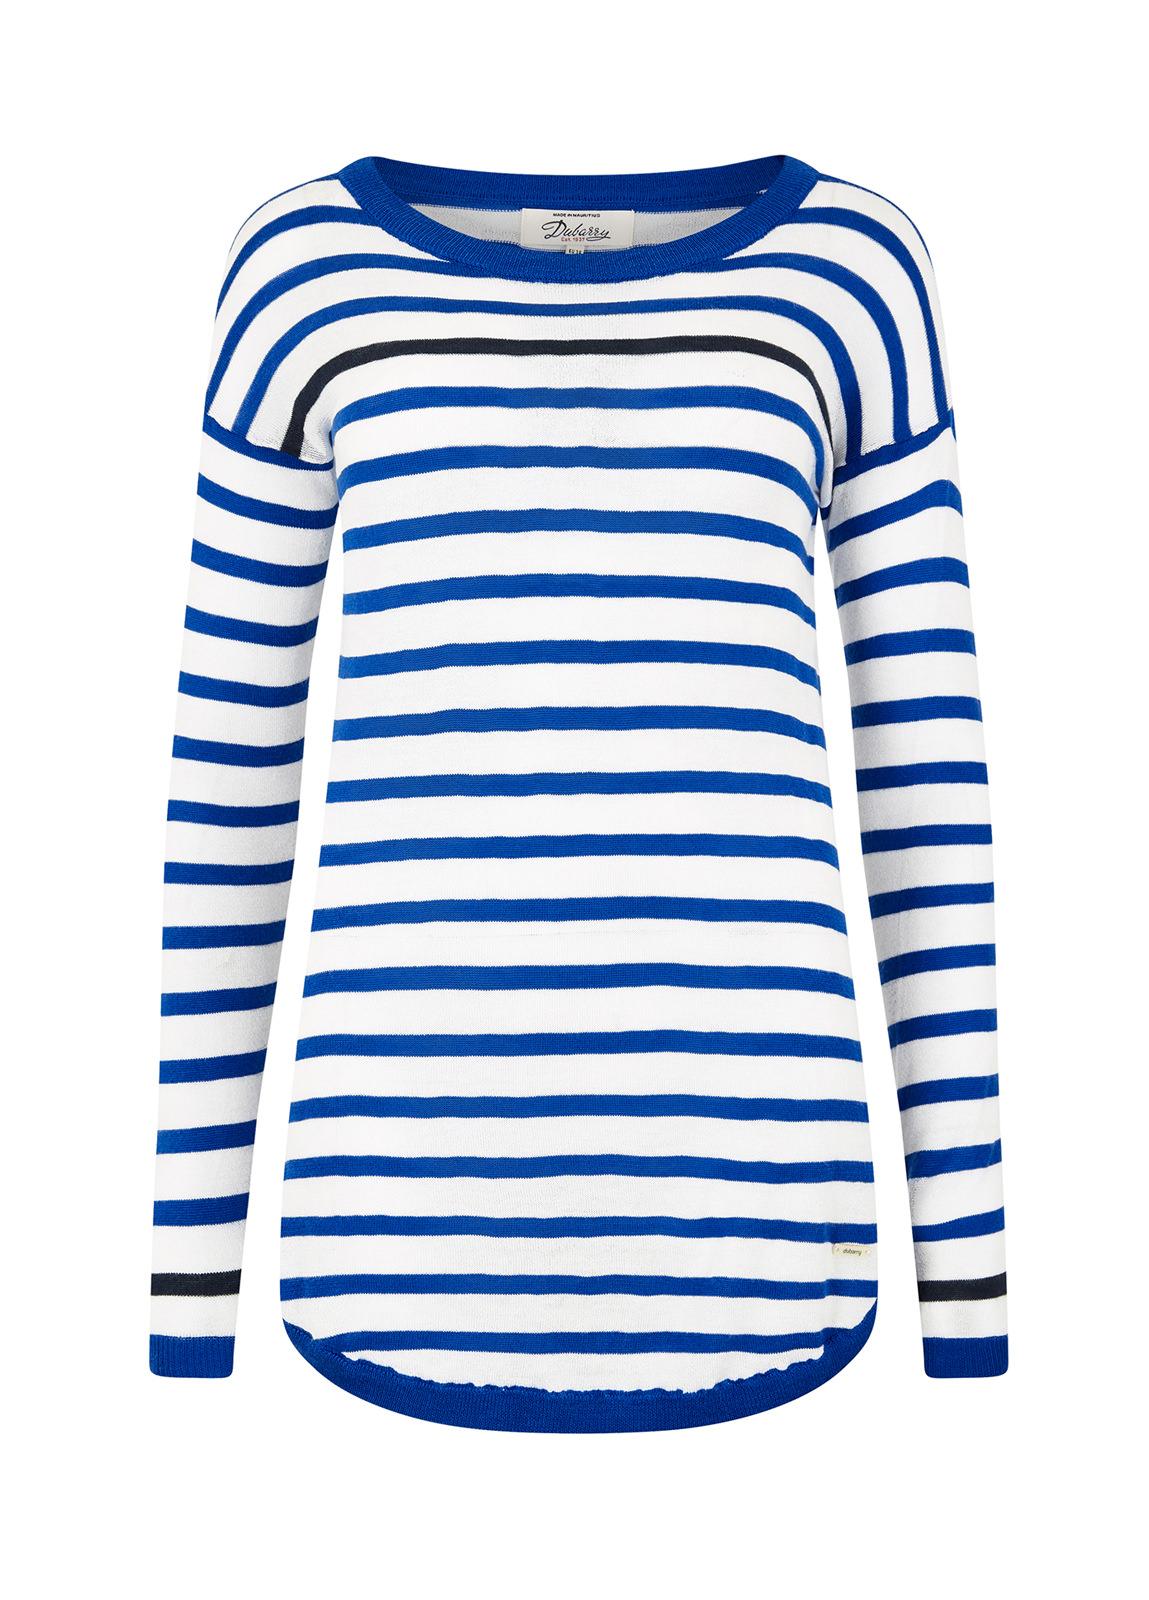 Dubarry_Abbeyside Sweater - Royal Blue_Image_2